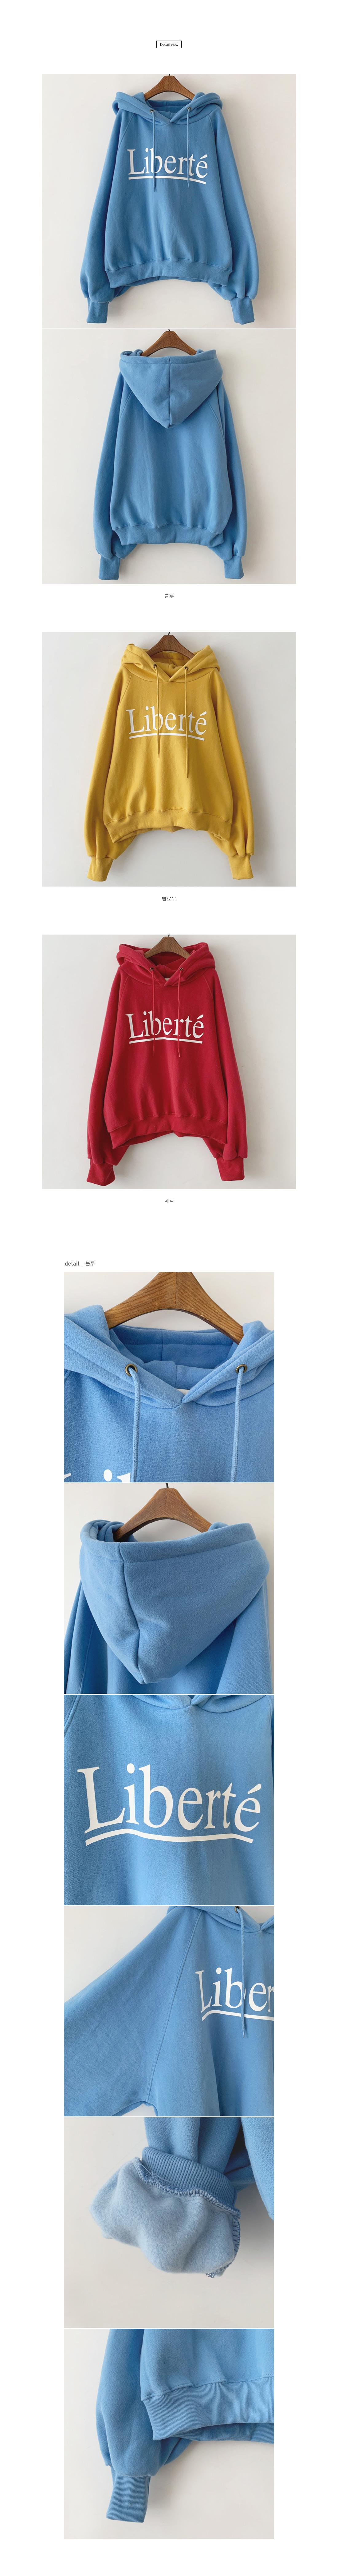 Liberty Sheepskin Hooded T-shirt